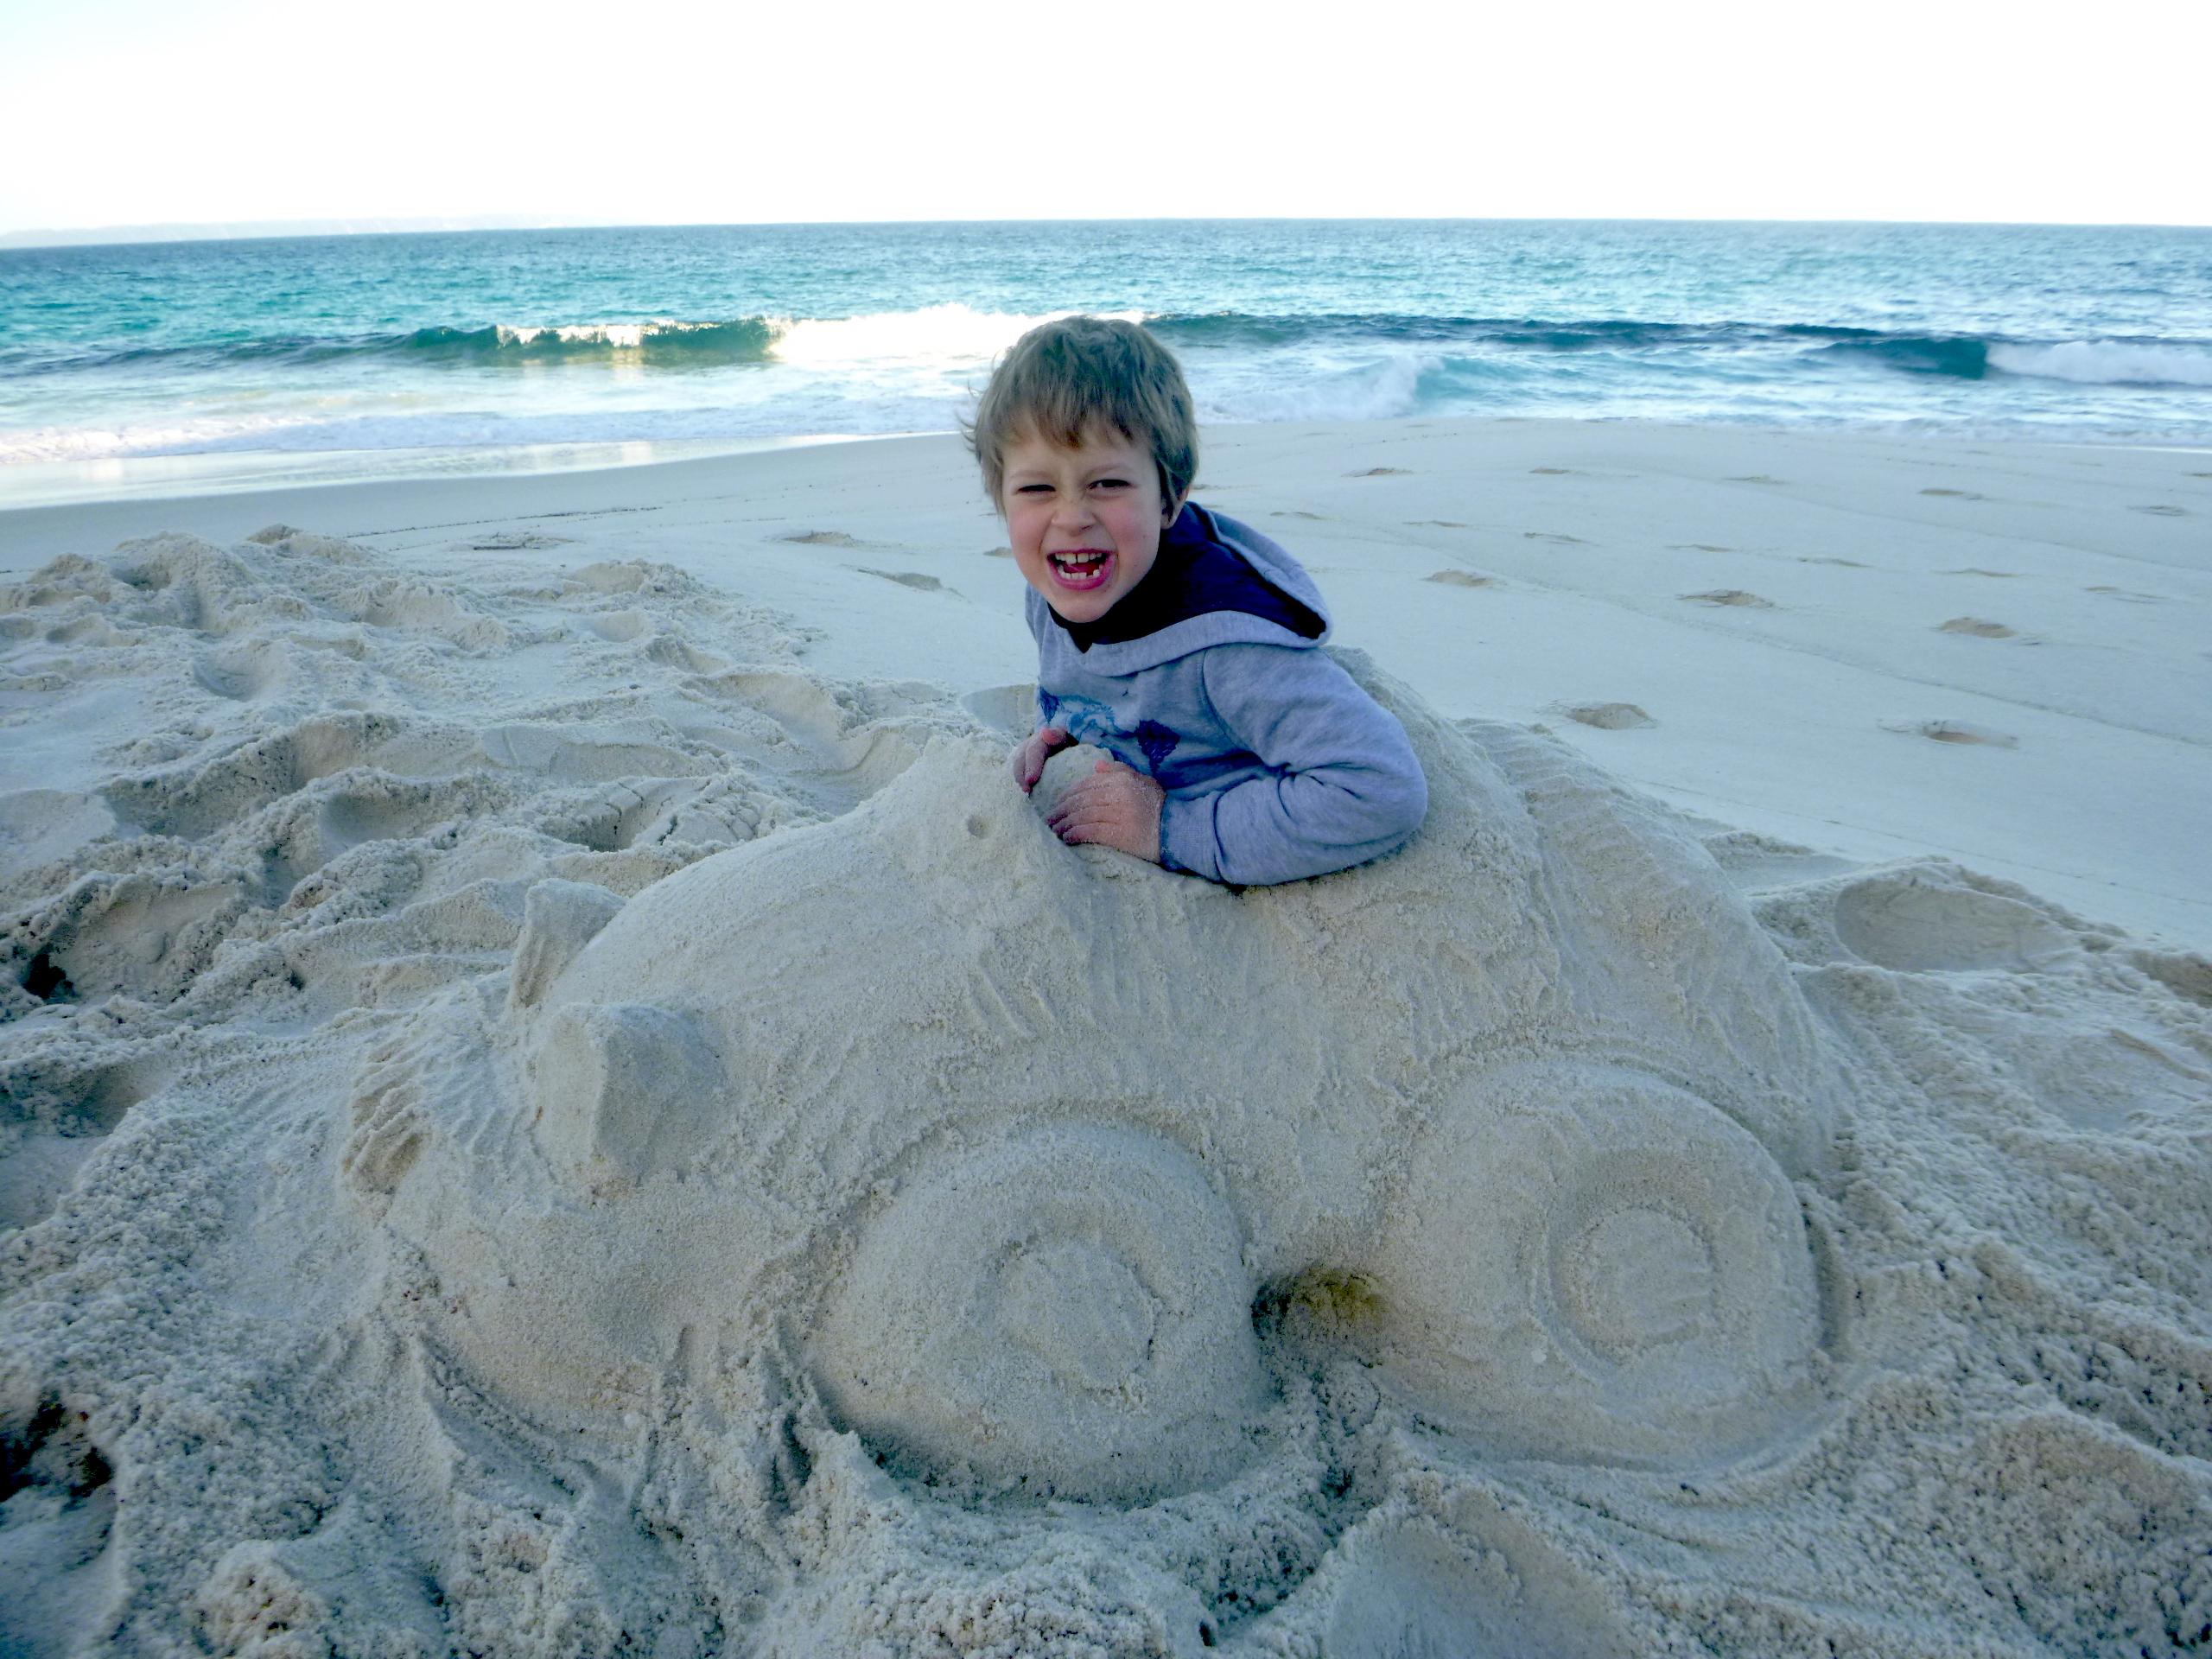 Child in sand car